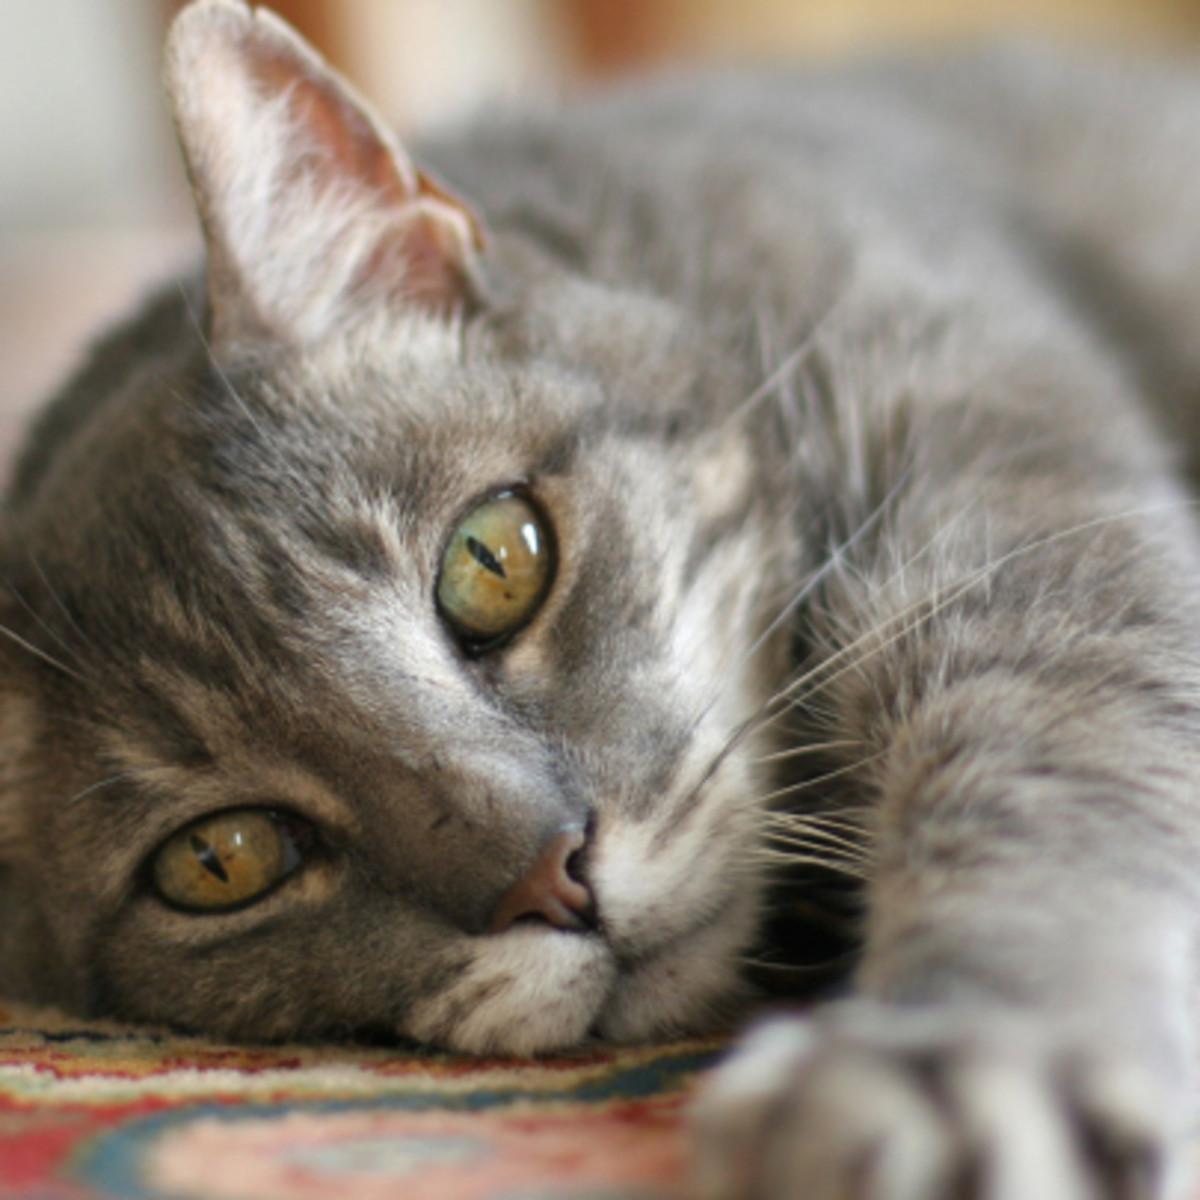 Feline Immunodeficiency Virus (FIV) In Cats